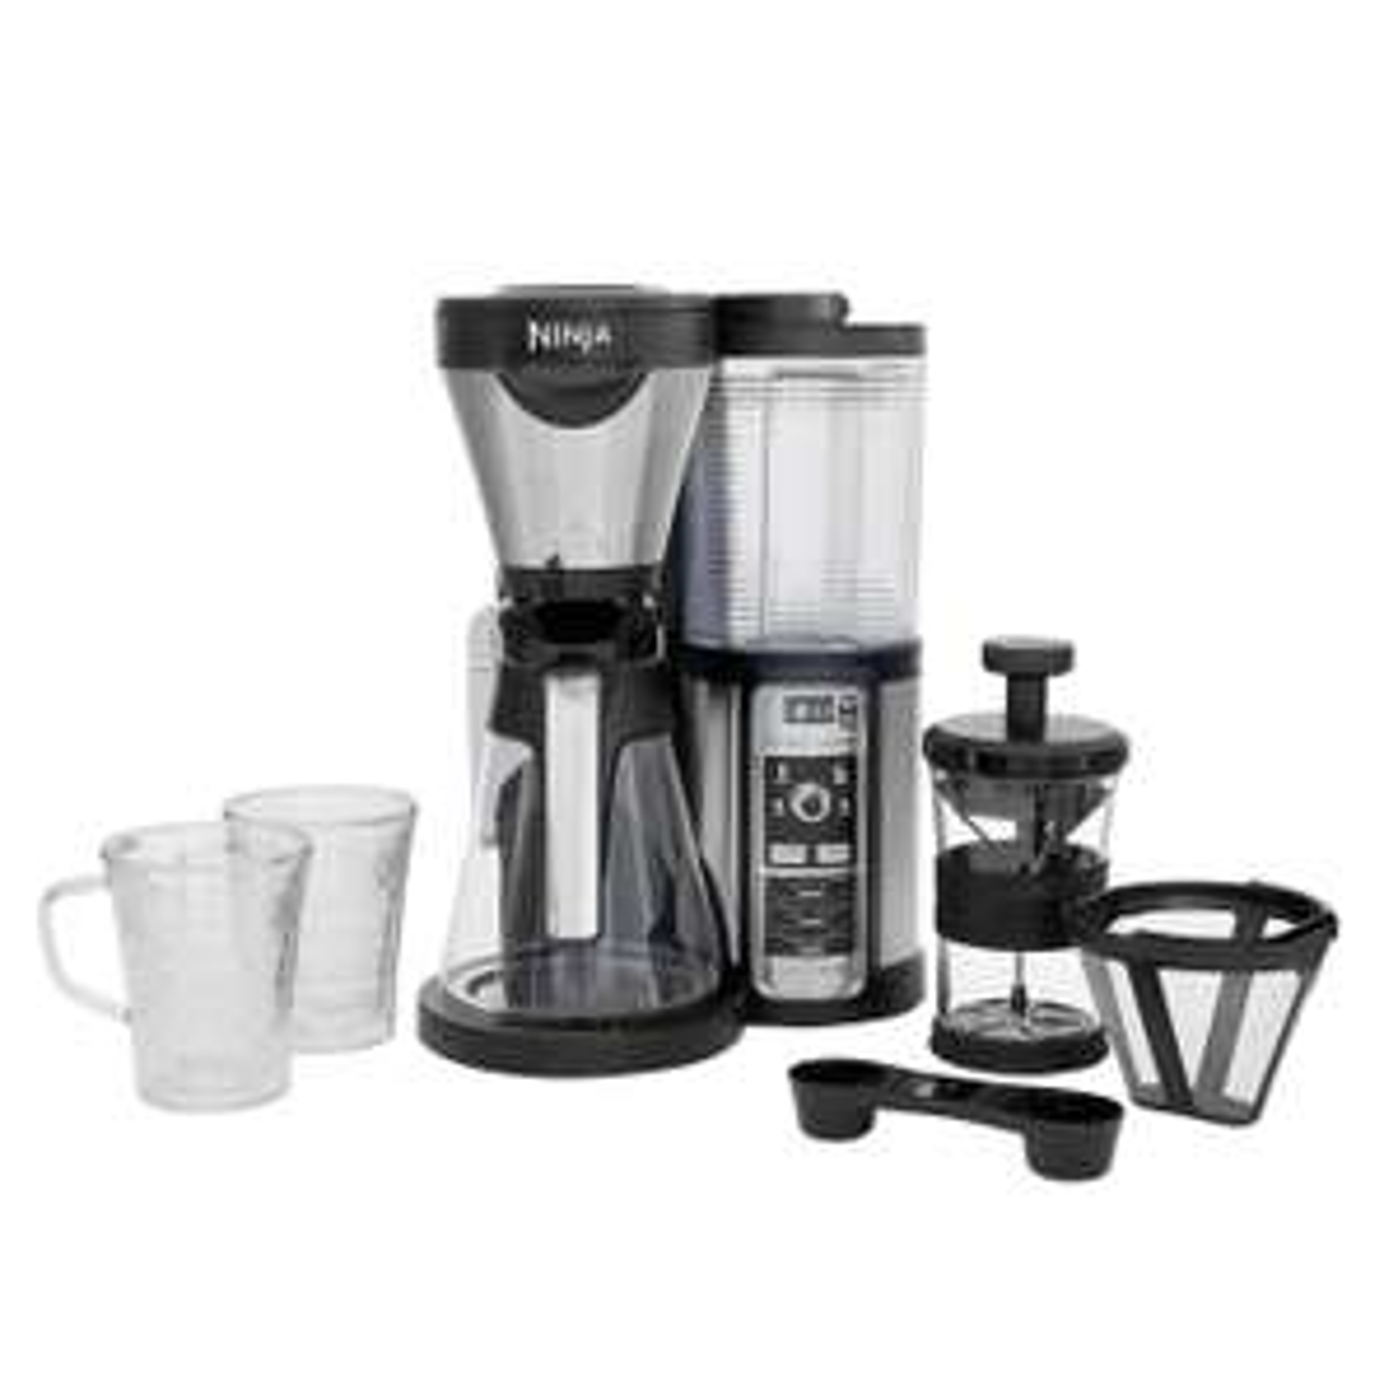 Ninja CF060UK Coffee Bar Auto-IQ Brewer with Glass Carafe £74.99 Amazon